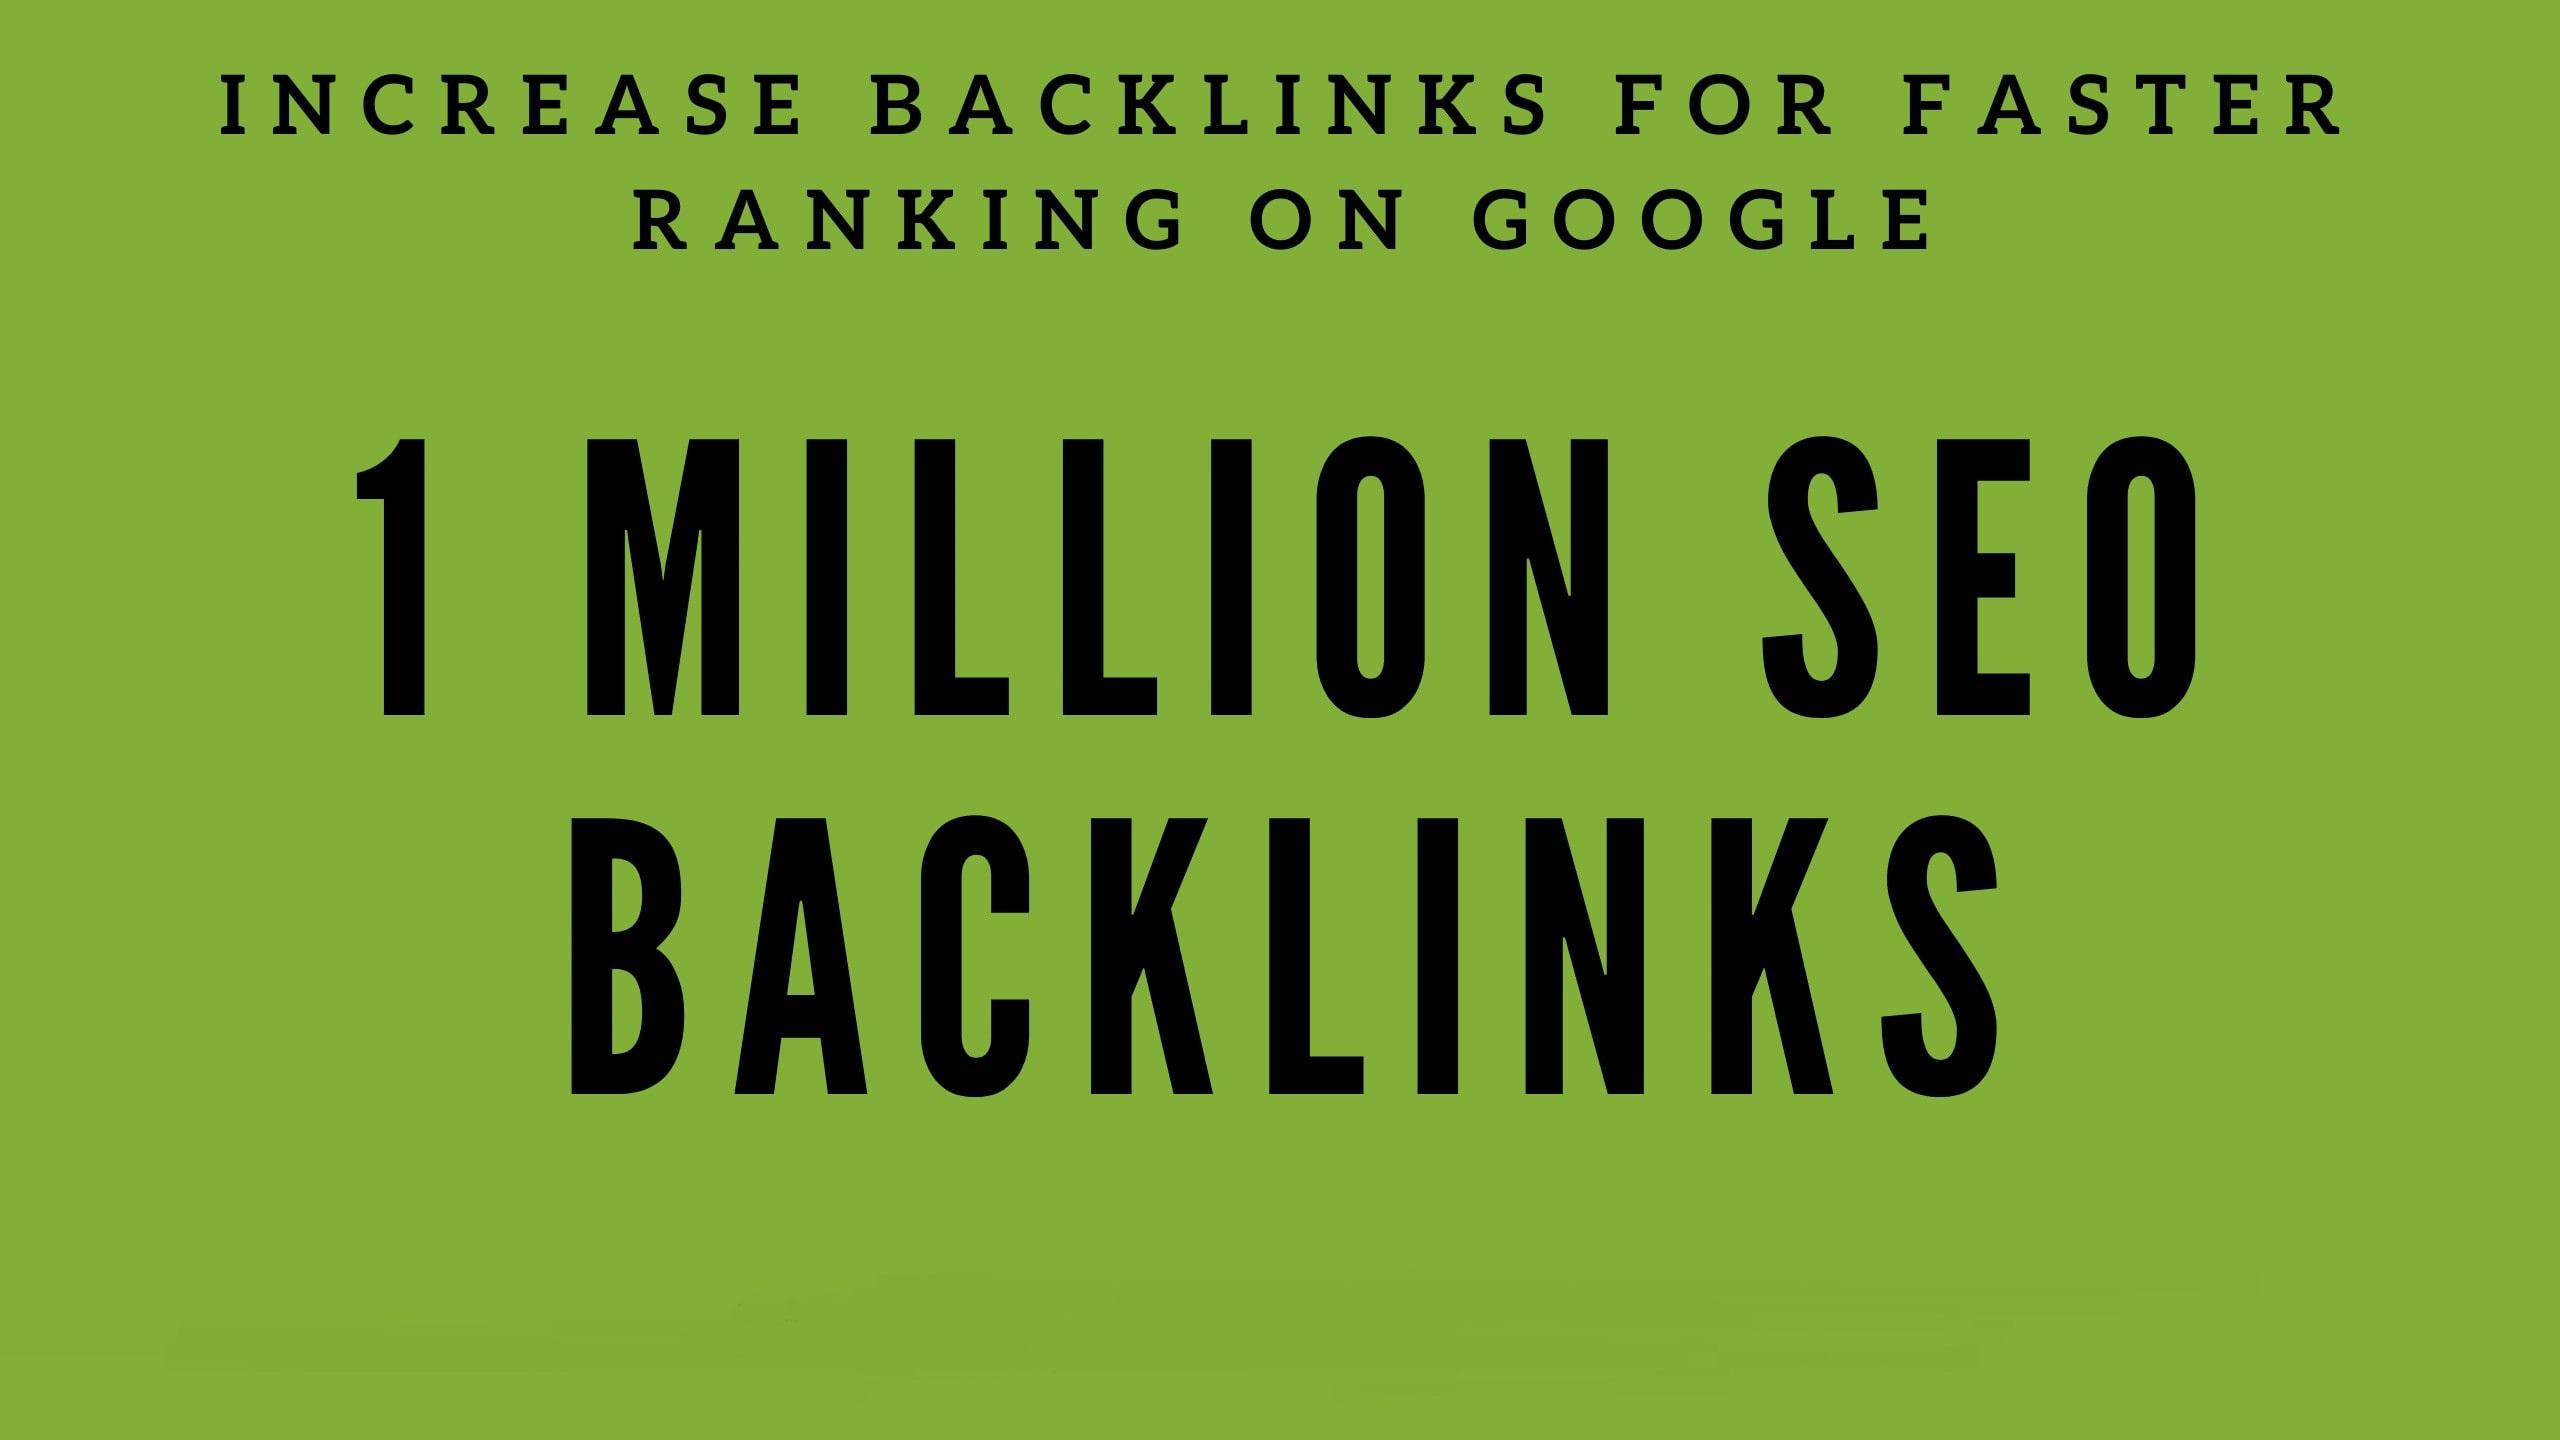 build 1 Billion backlinks for your url/s and keyword/s